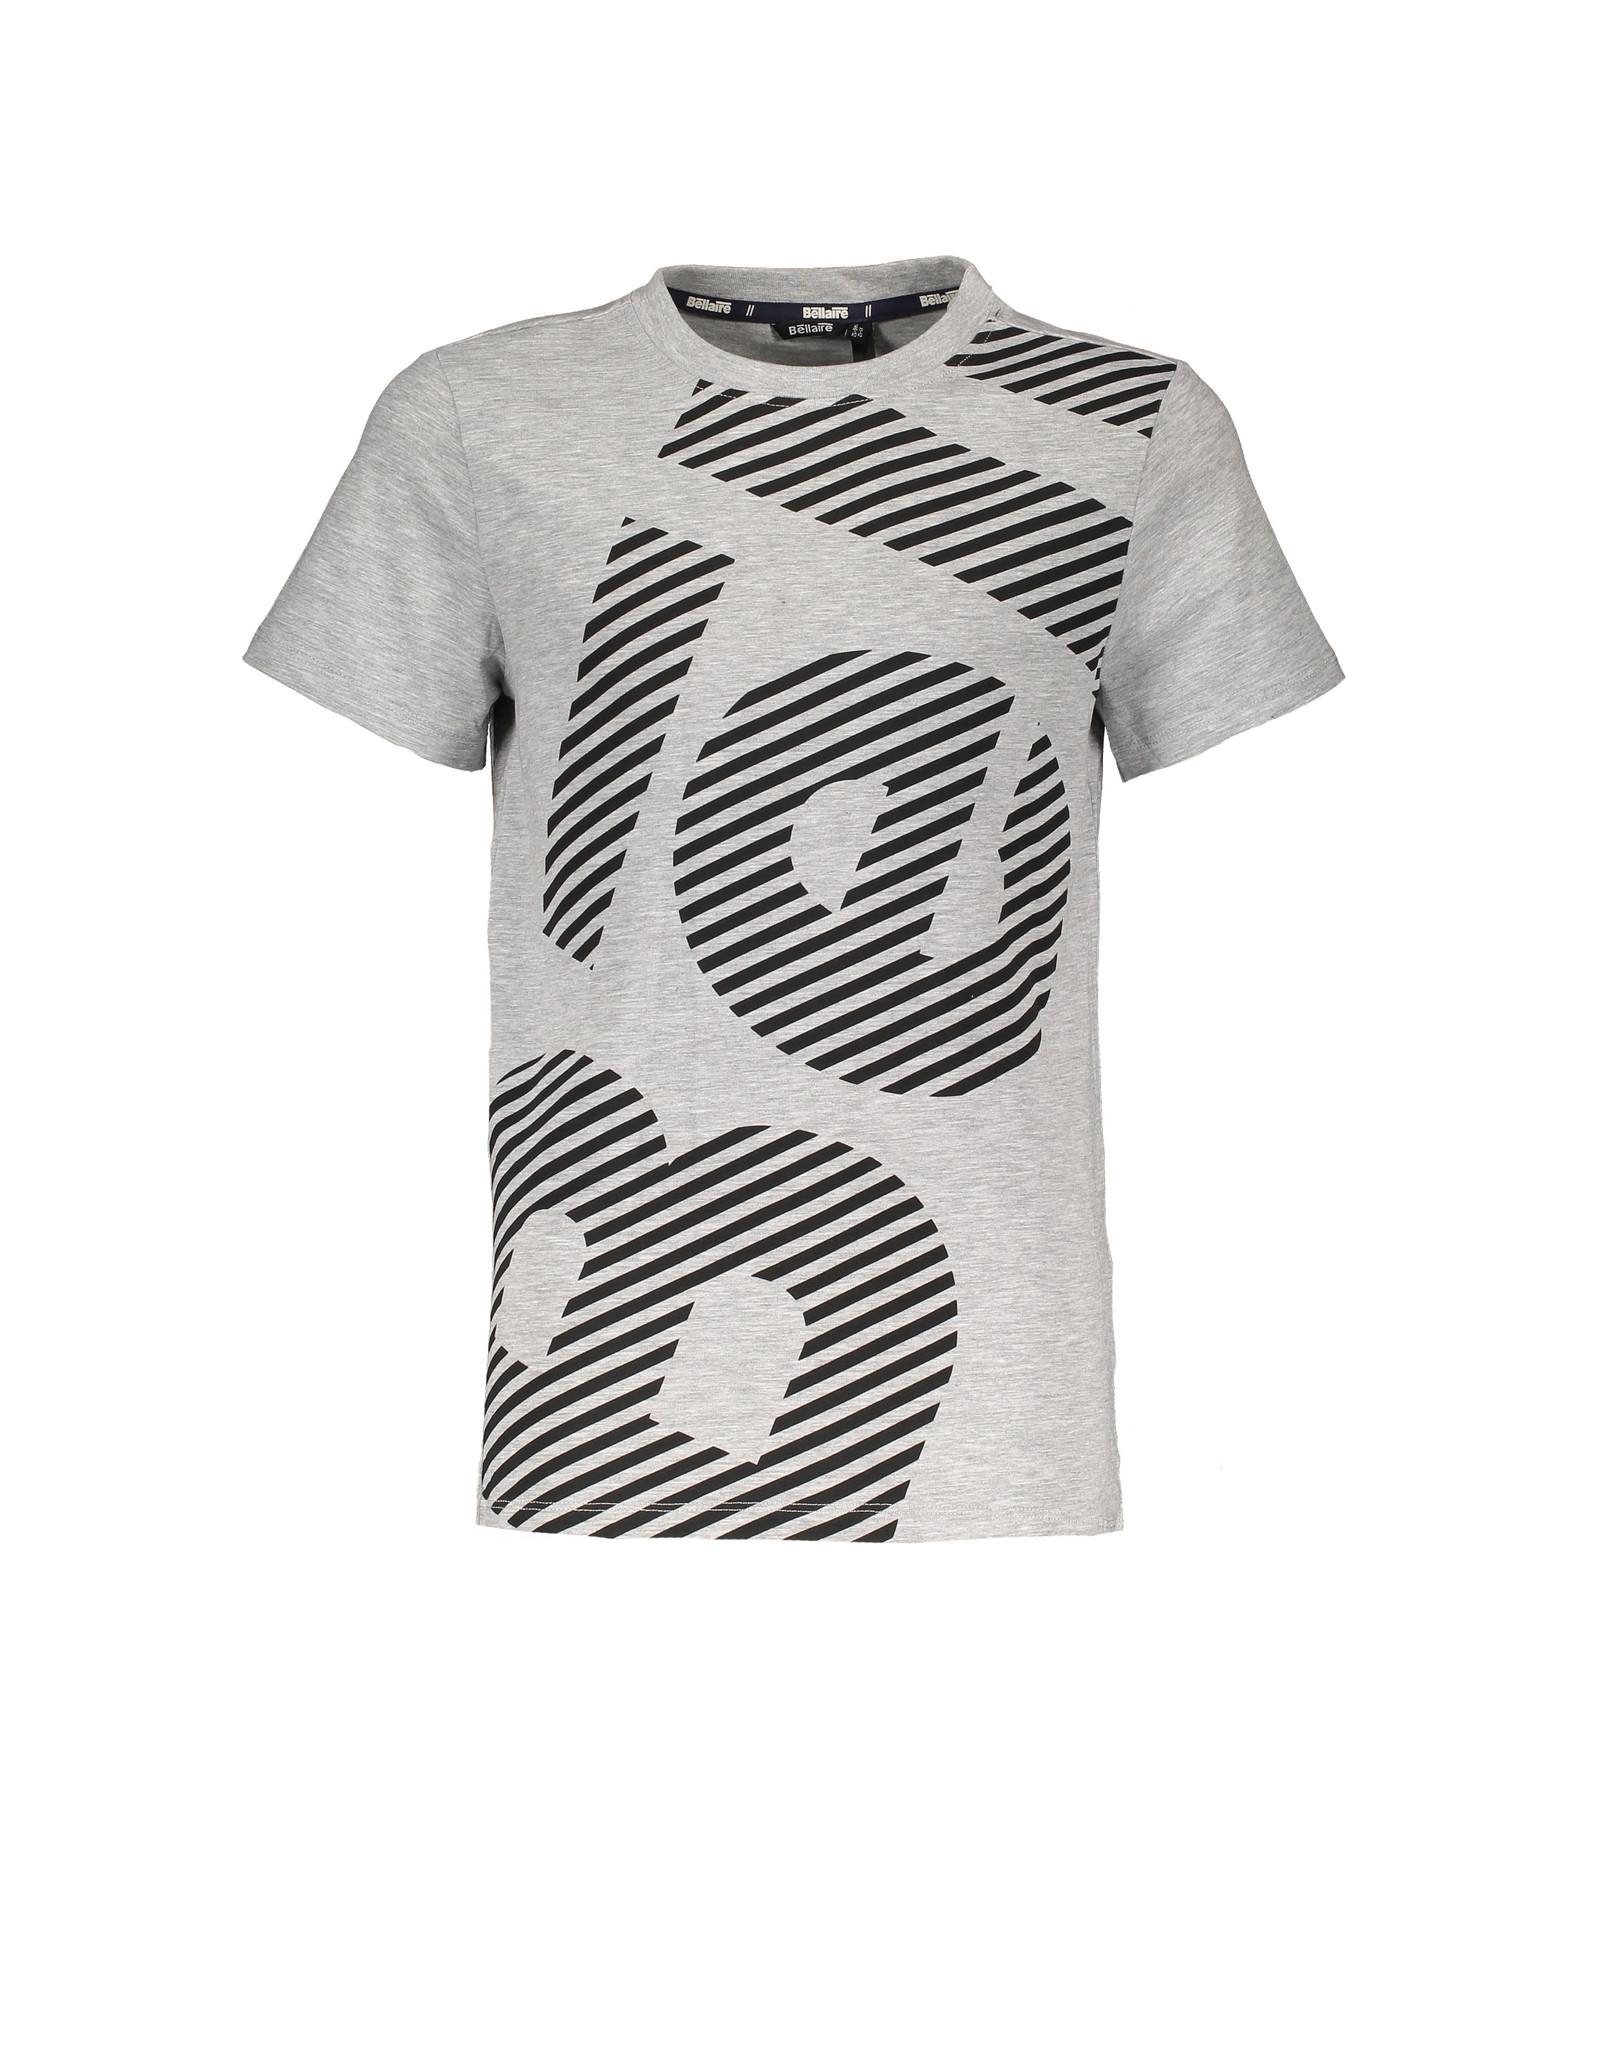 Bellaire Kurt shortsleeves T-shirt + KunC LGM